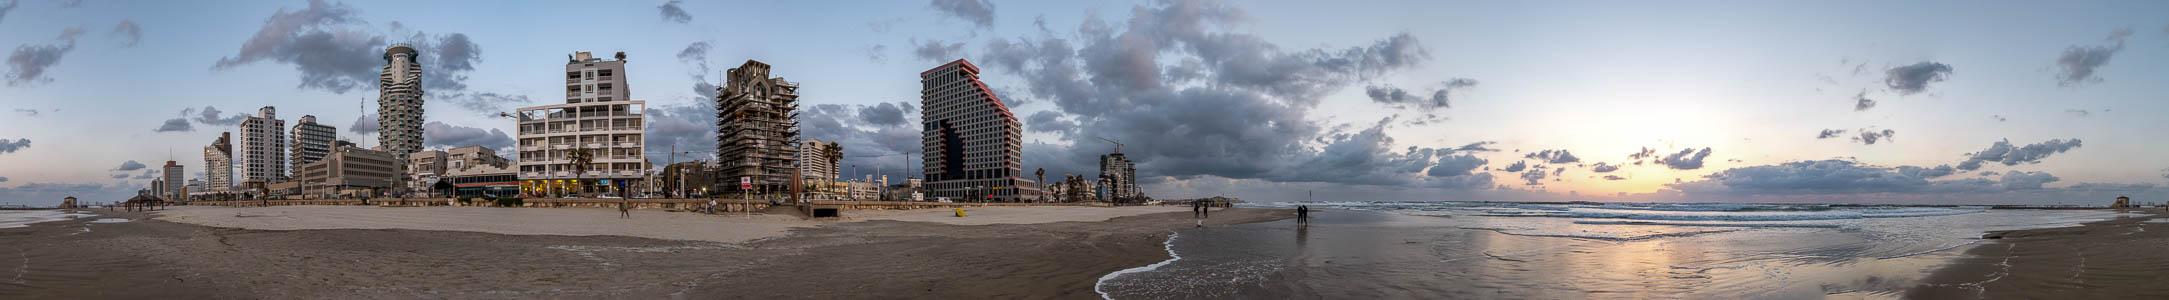 Tel Aviv Skyline mit Strand, Mittelmeer mit Sonnenuntergang